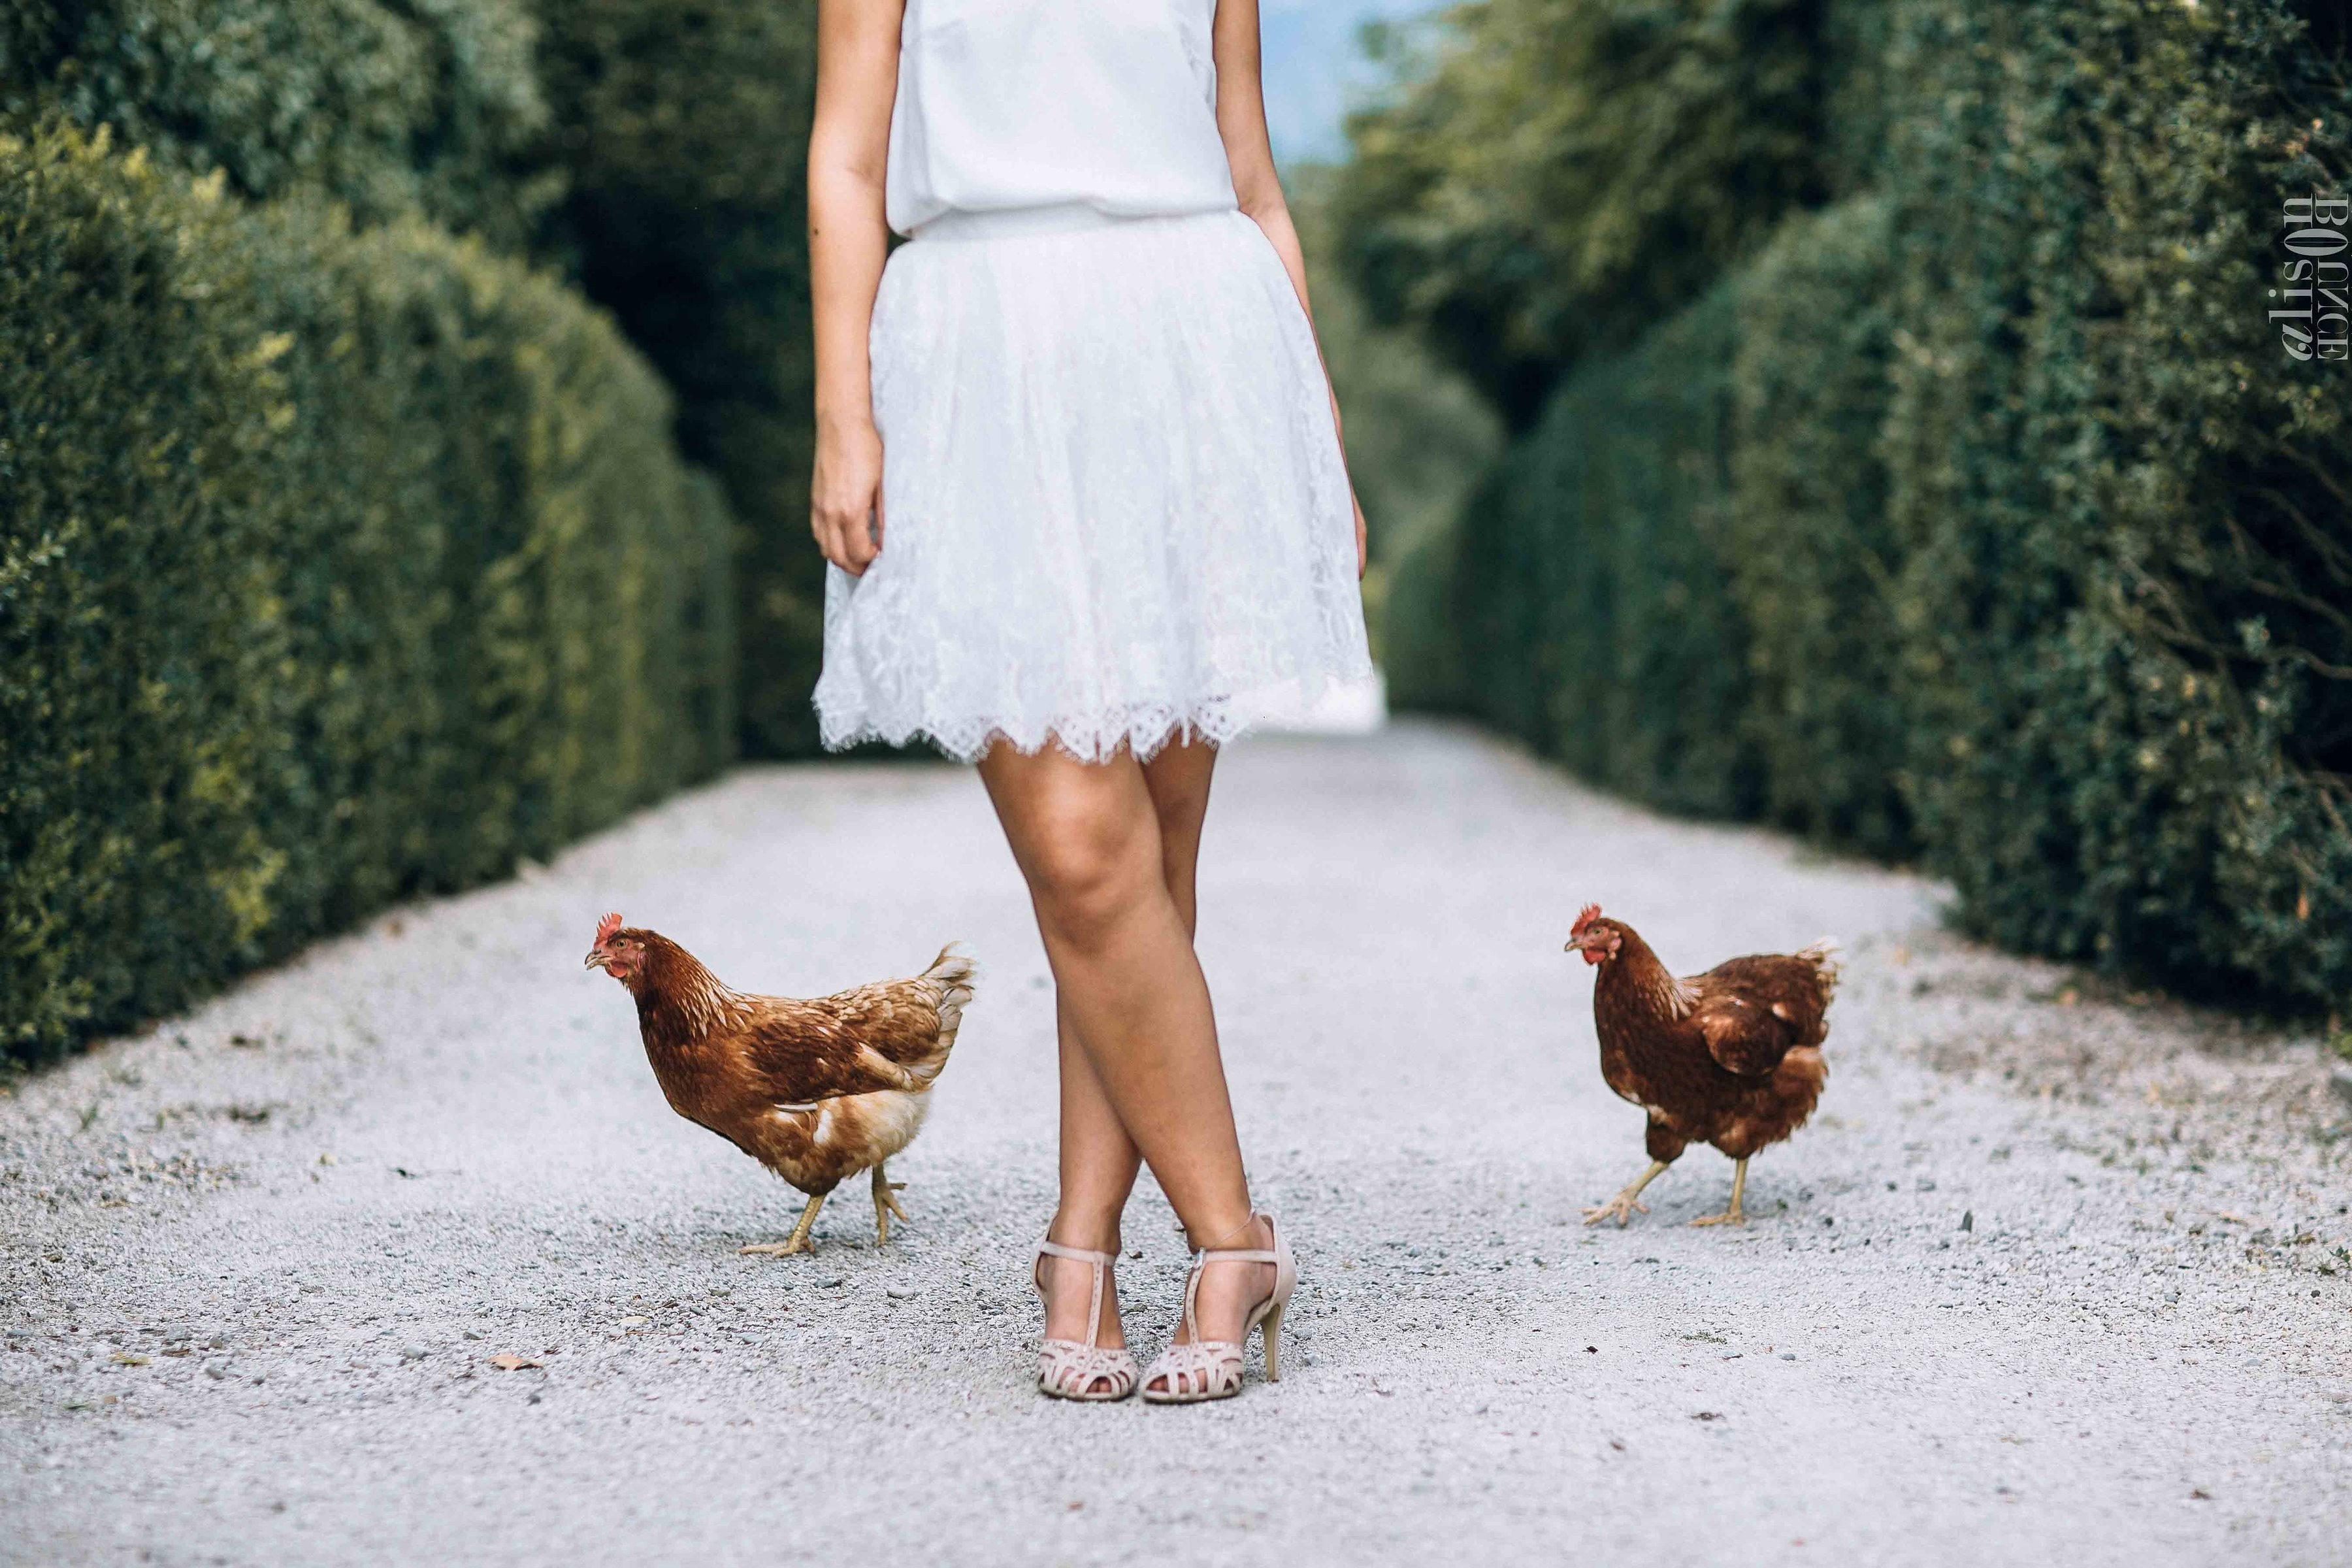 Astrid à la ferme